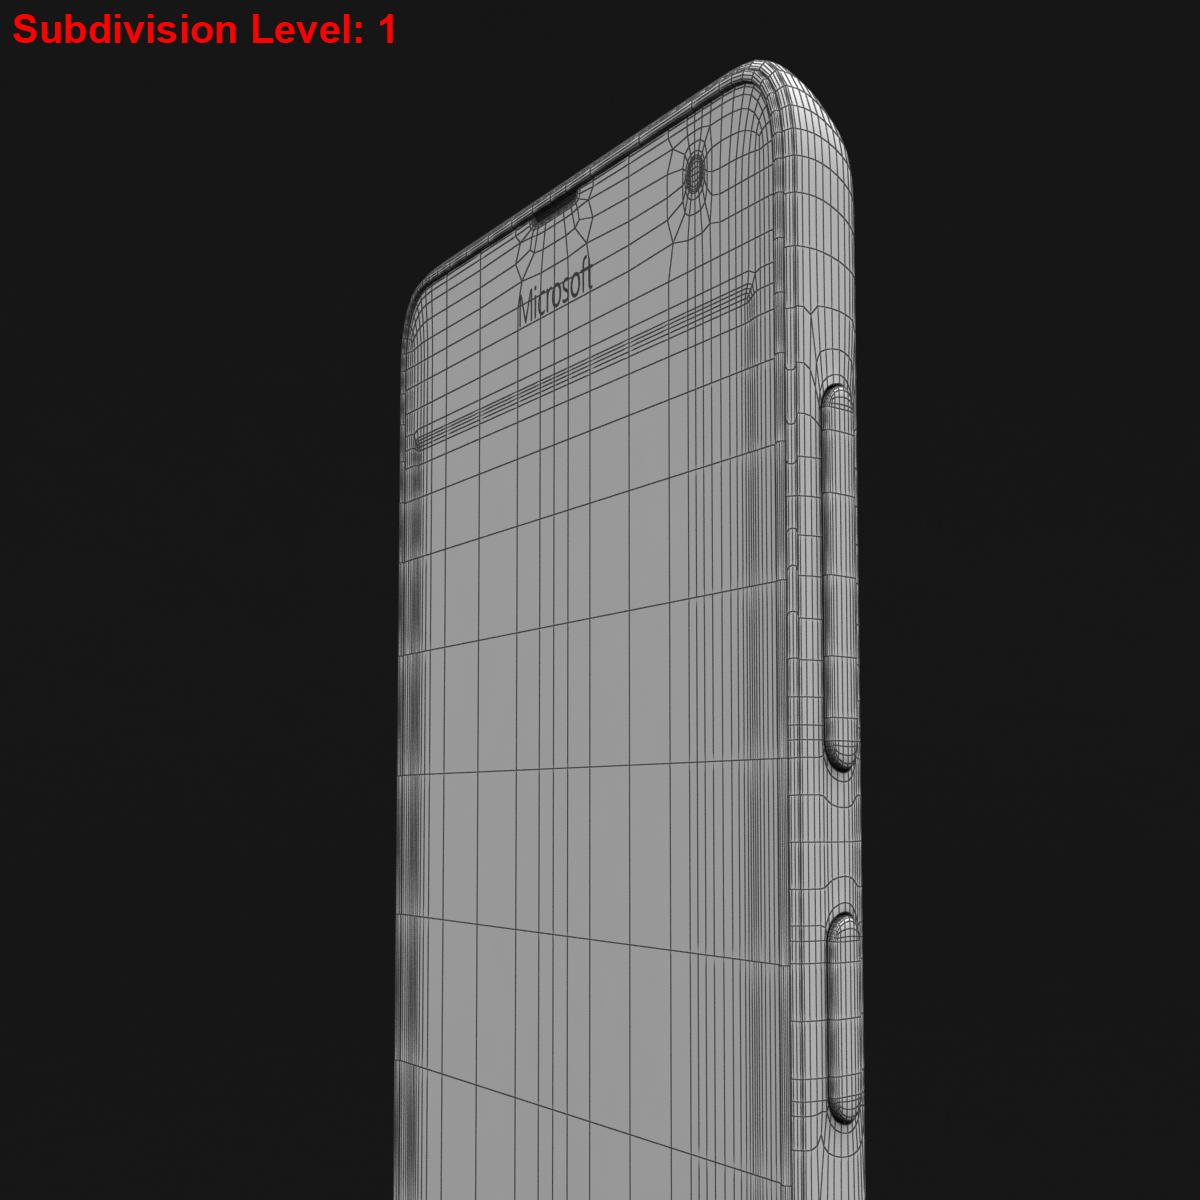 microsoft lumia 535 and dual sim blue 3d model 3ds max fbx c4d obj 204540